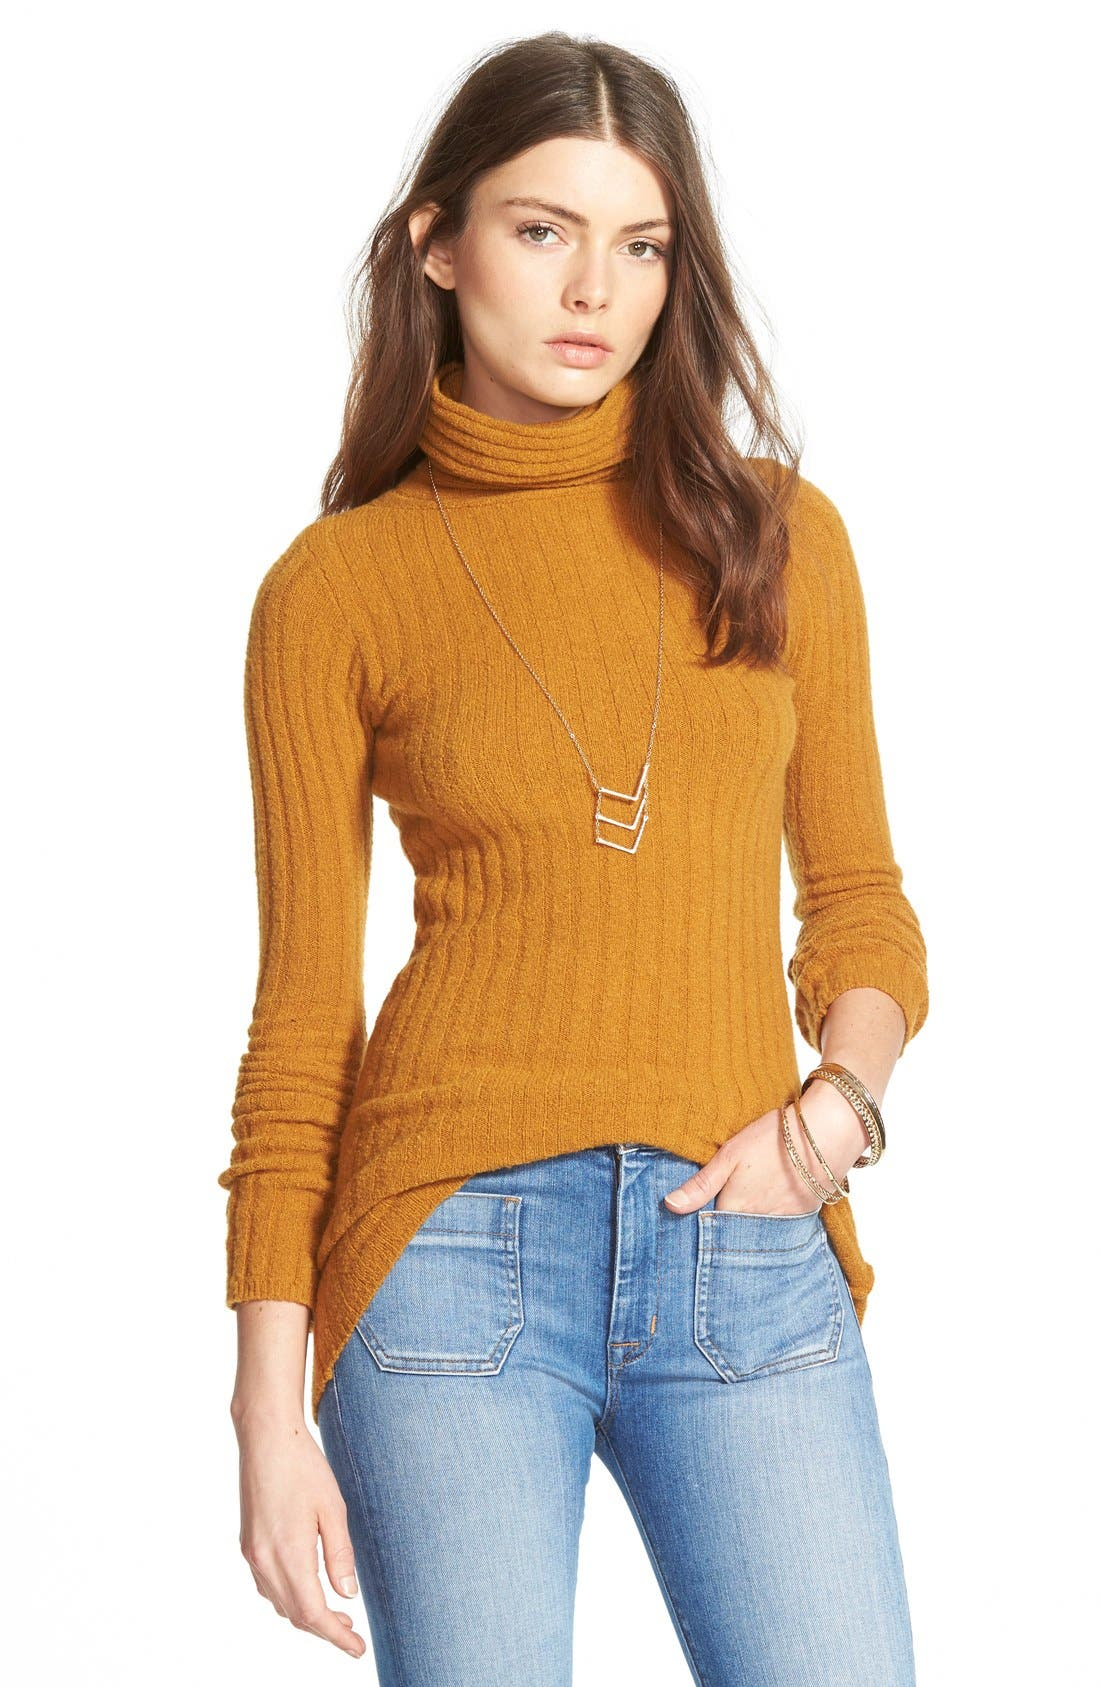 Alternate Image 1 Selected - Free People Ribbed Turtleneck Sweater